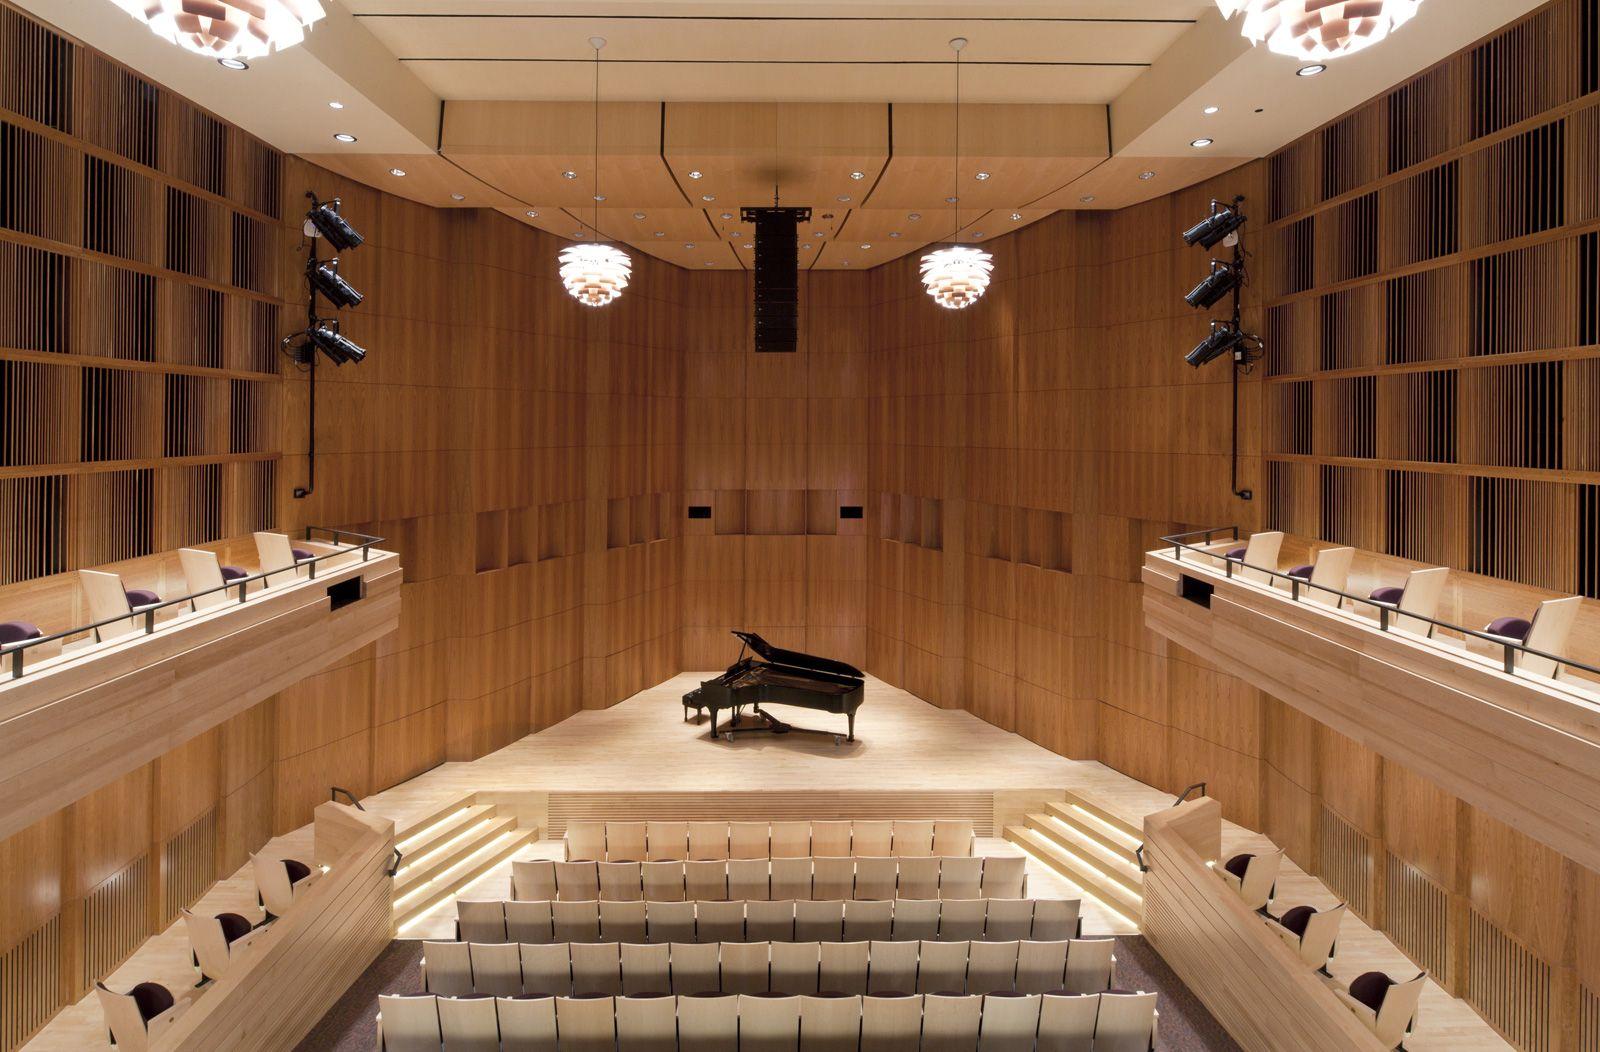 Hatch recital hall thesis inspiration auditorium - Interior decorators rochester ny ...